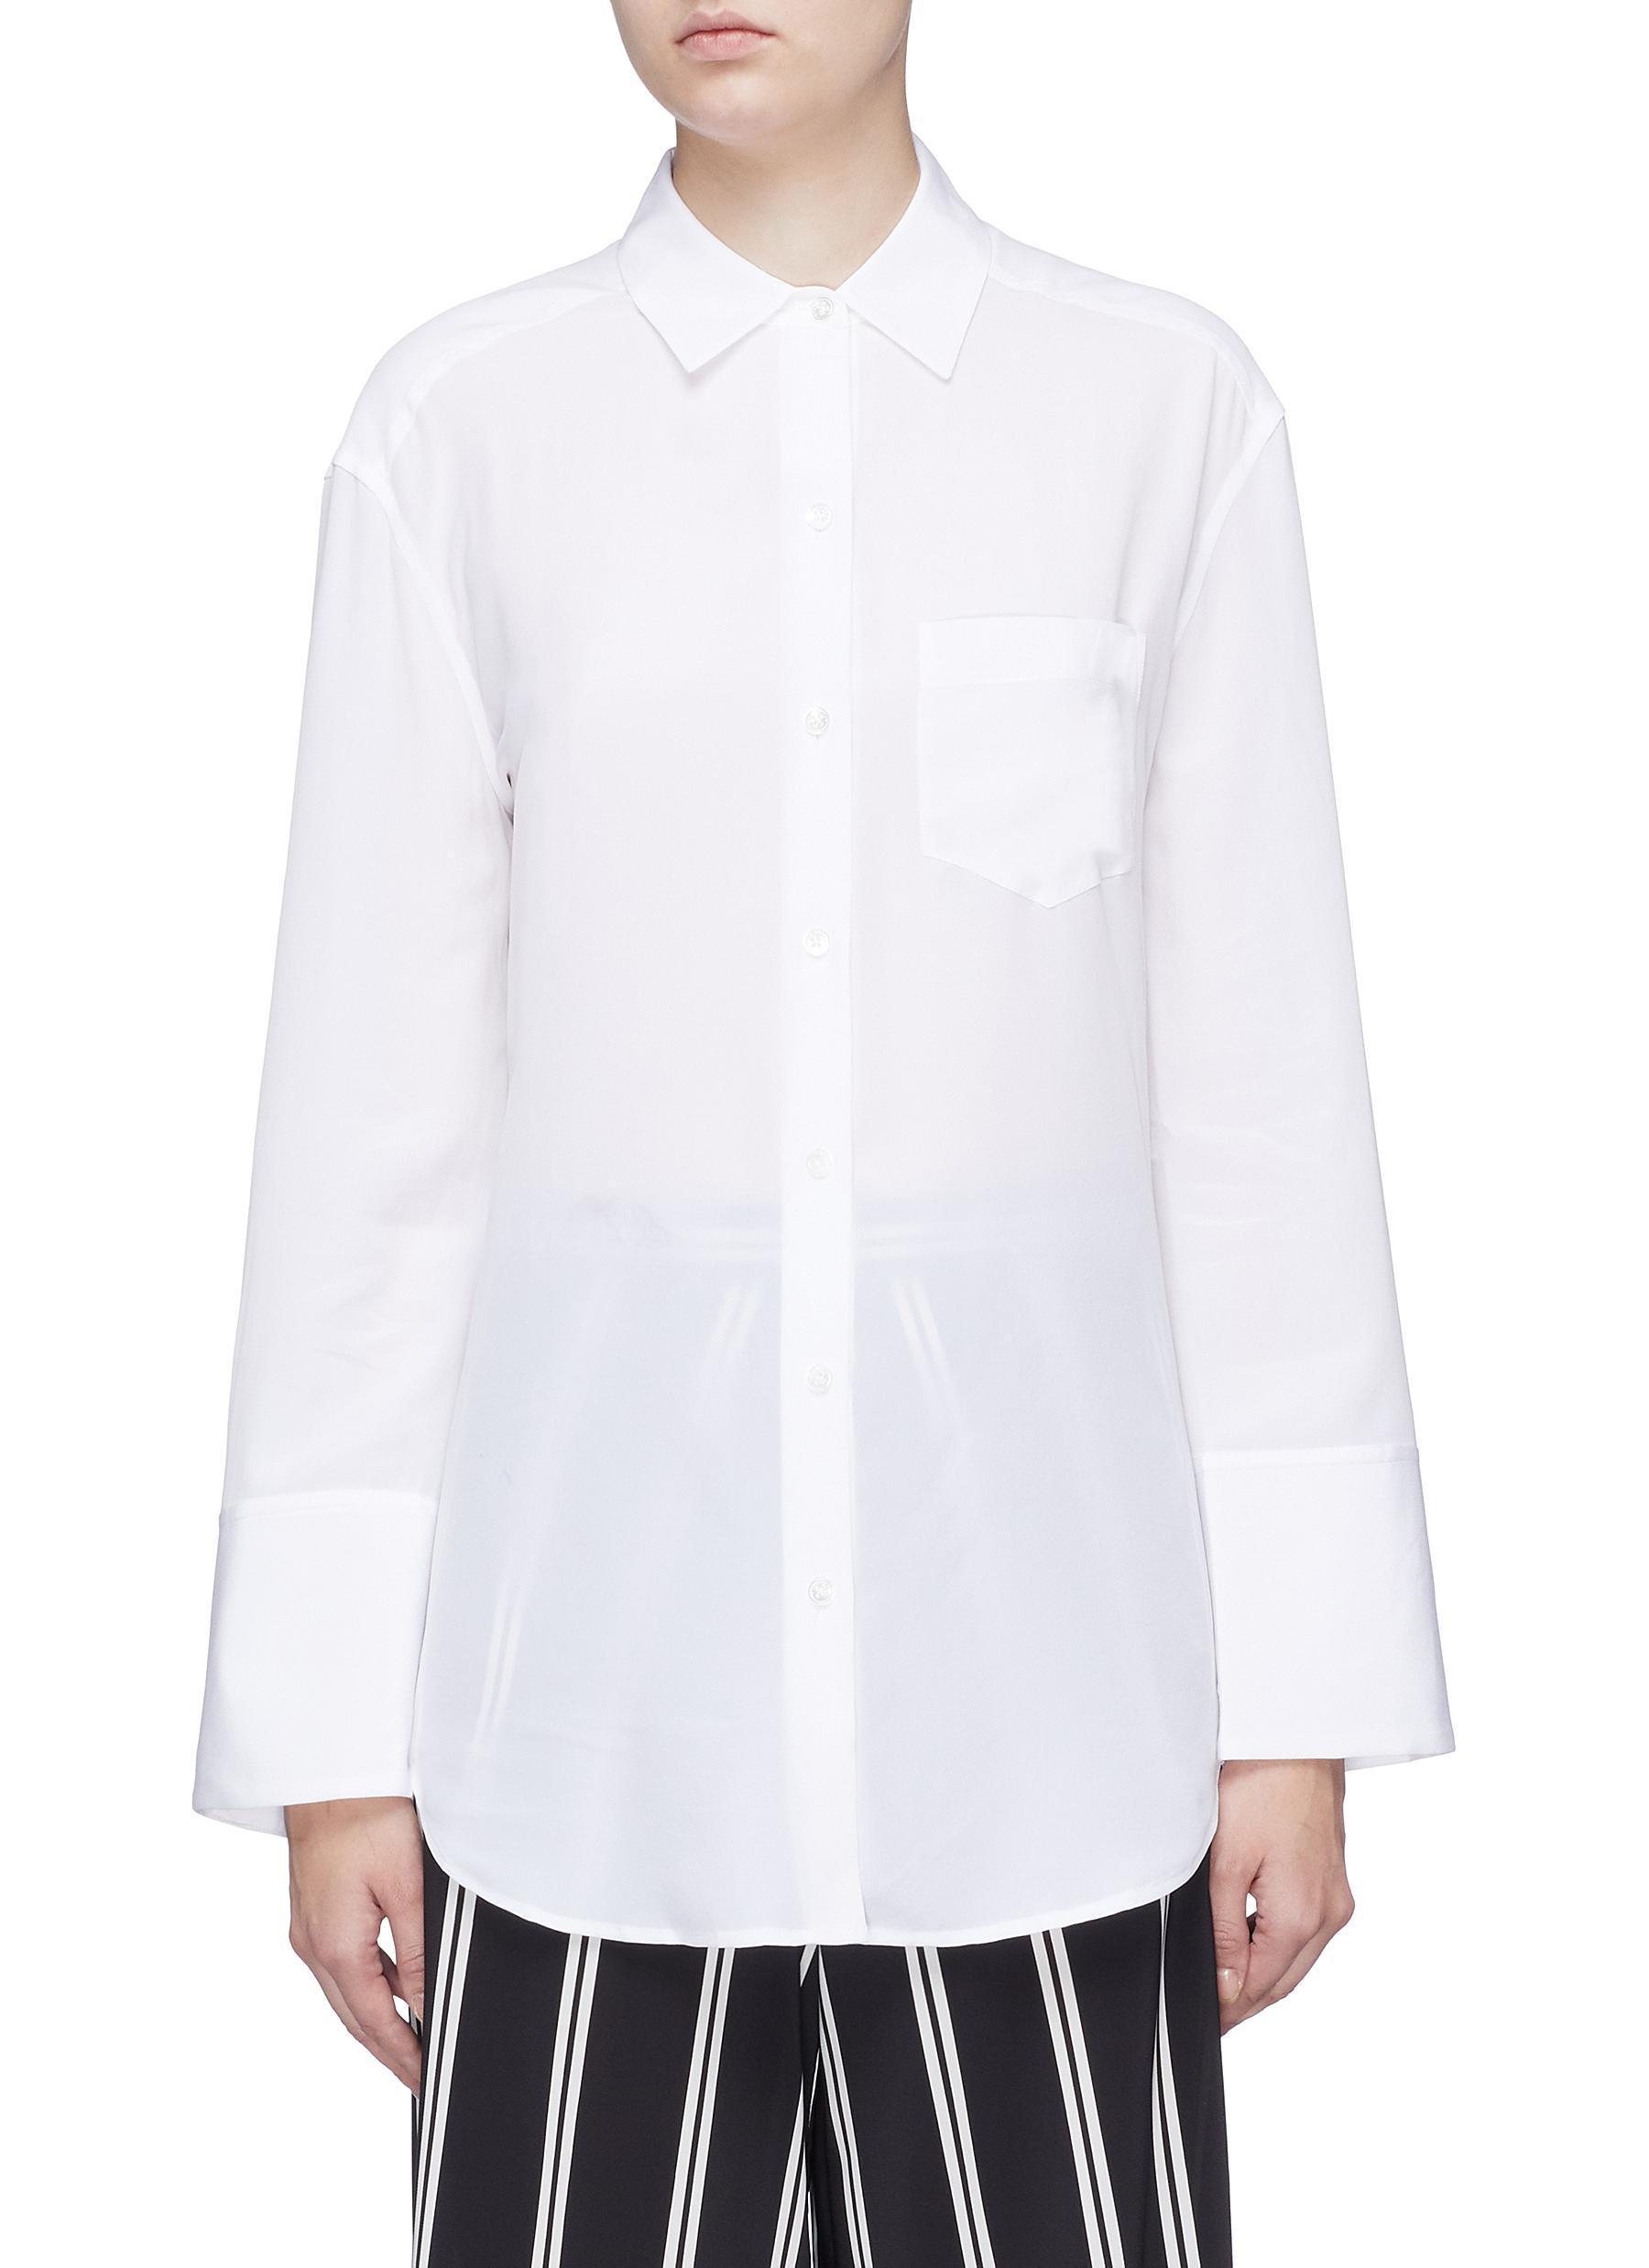 coco shirt Equipment Cheap Sale Professional Free Shipping Very Cheap Cheap Sale Manchester QWoY5x